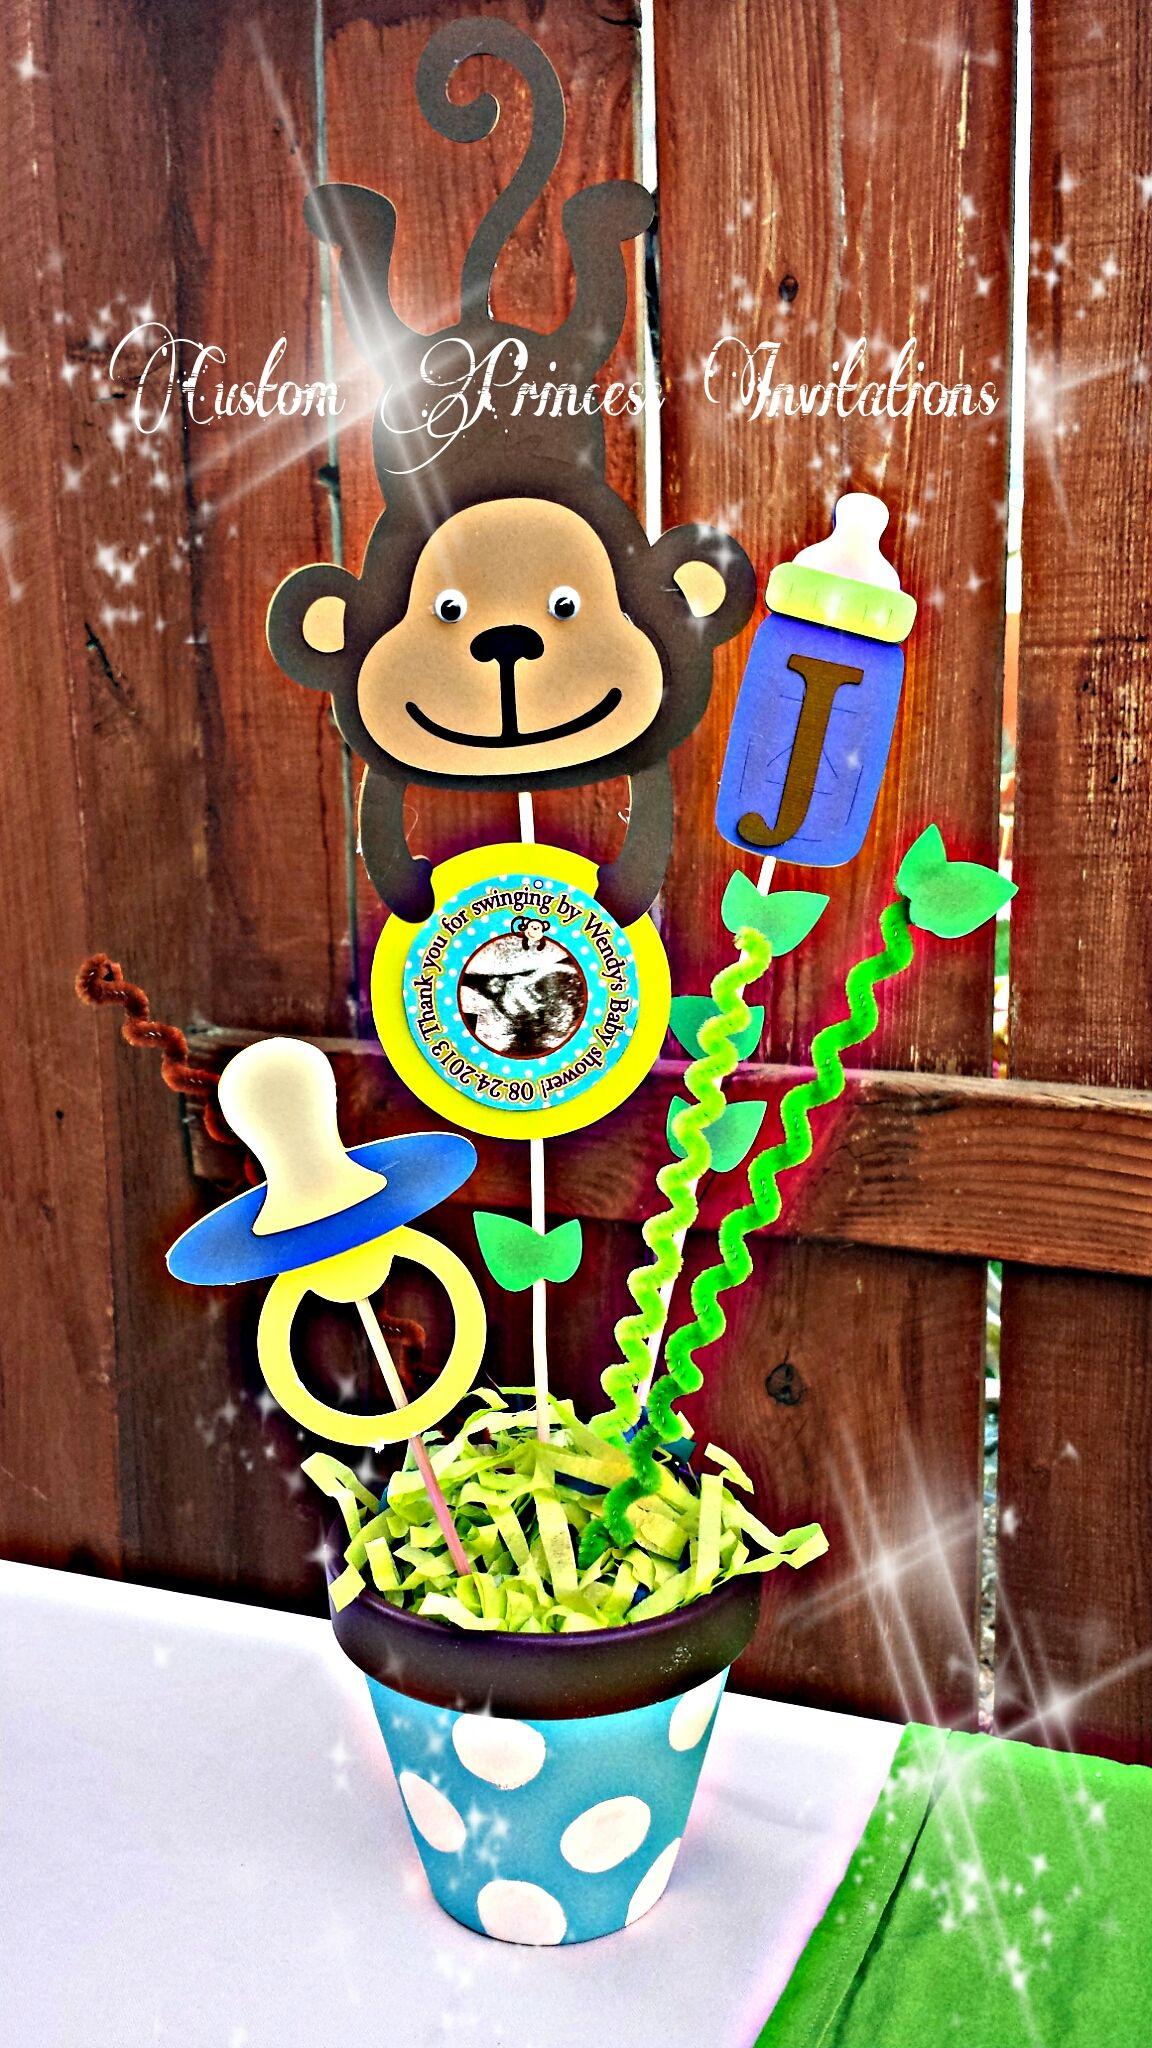 Monkey baby shower theme baby shower pinterest monkey baby baby shower themes and monkey - Baby shower monkey pictures ...